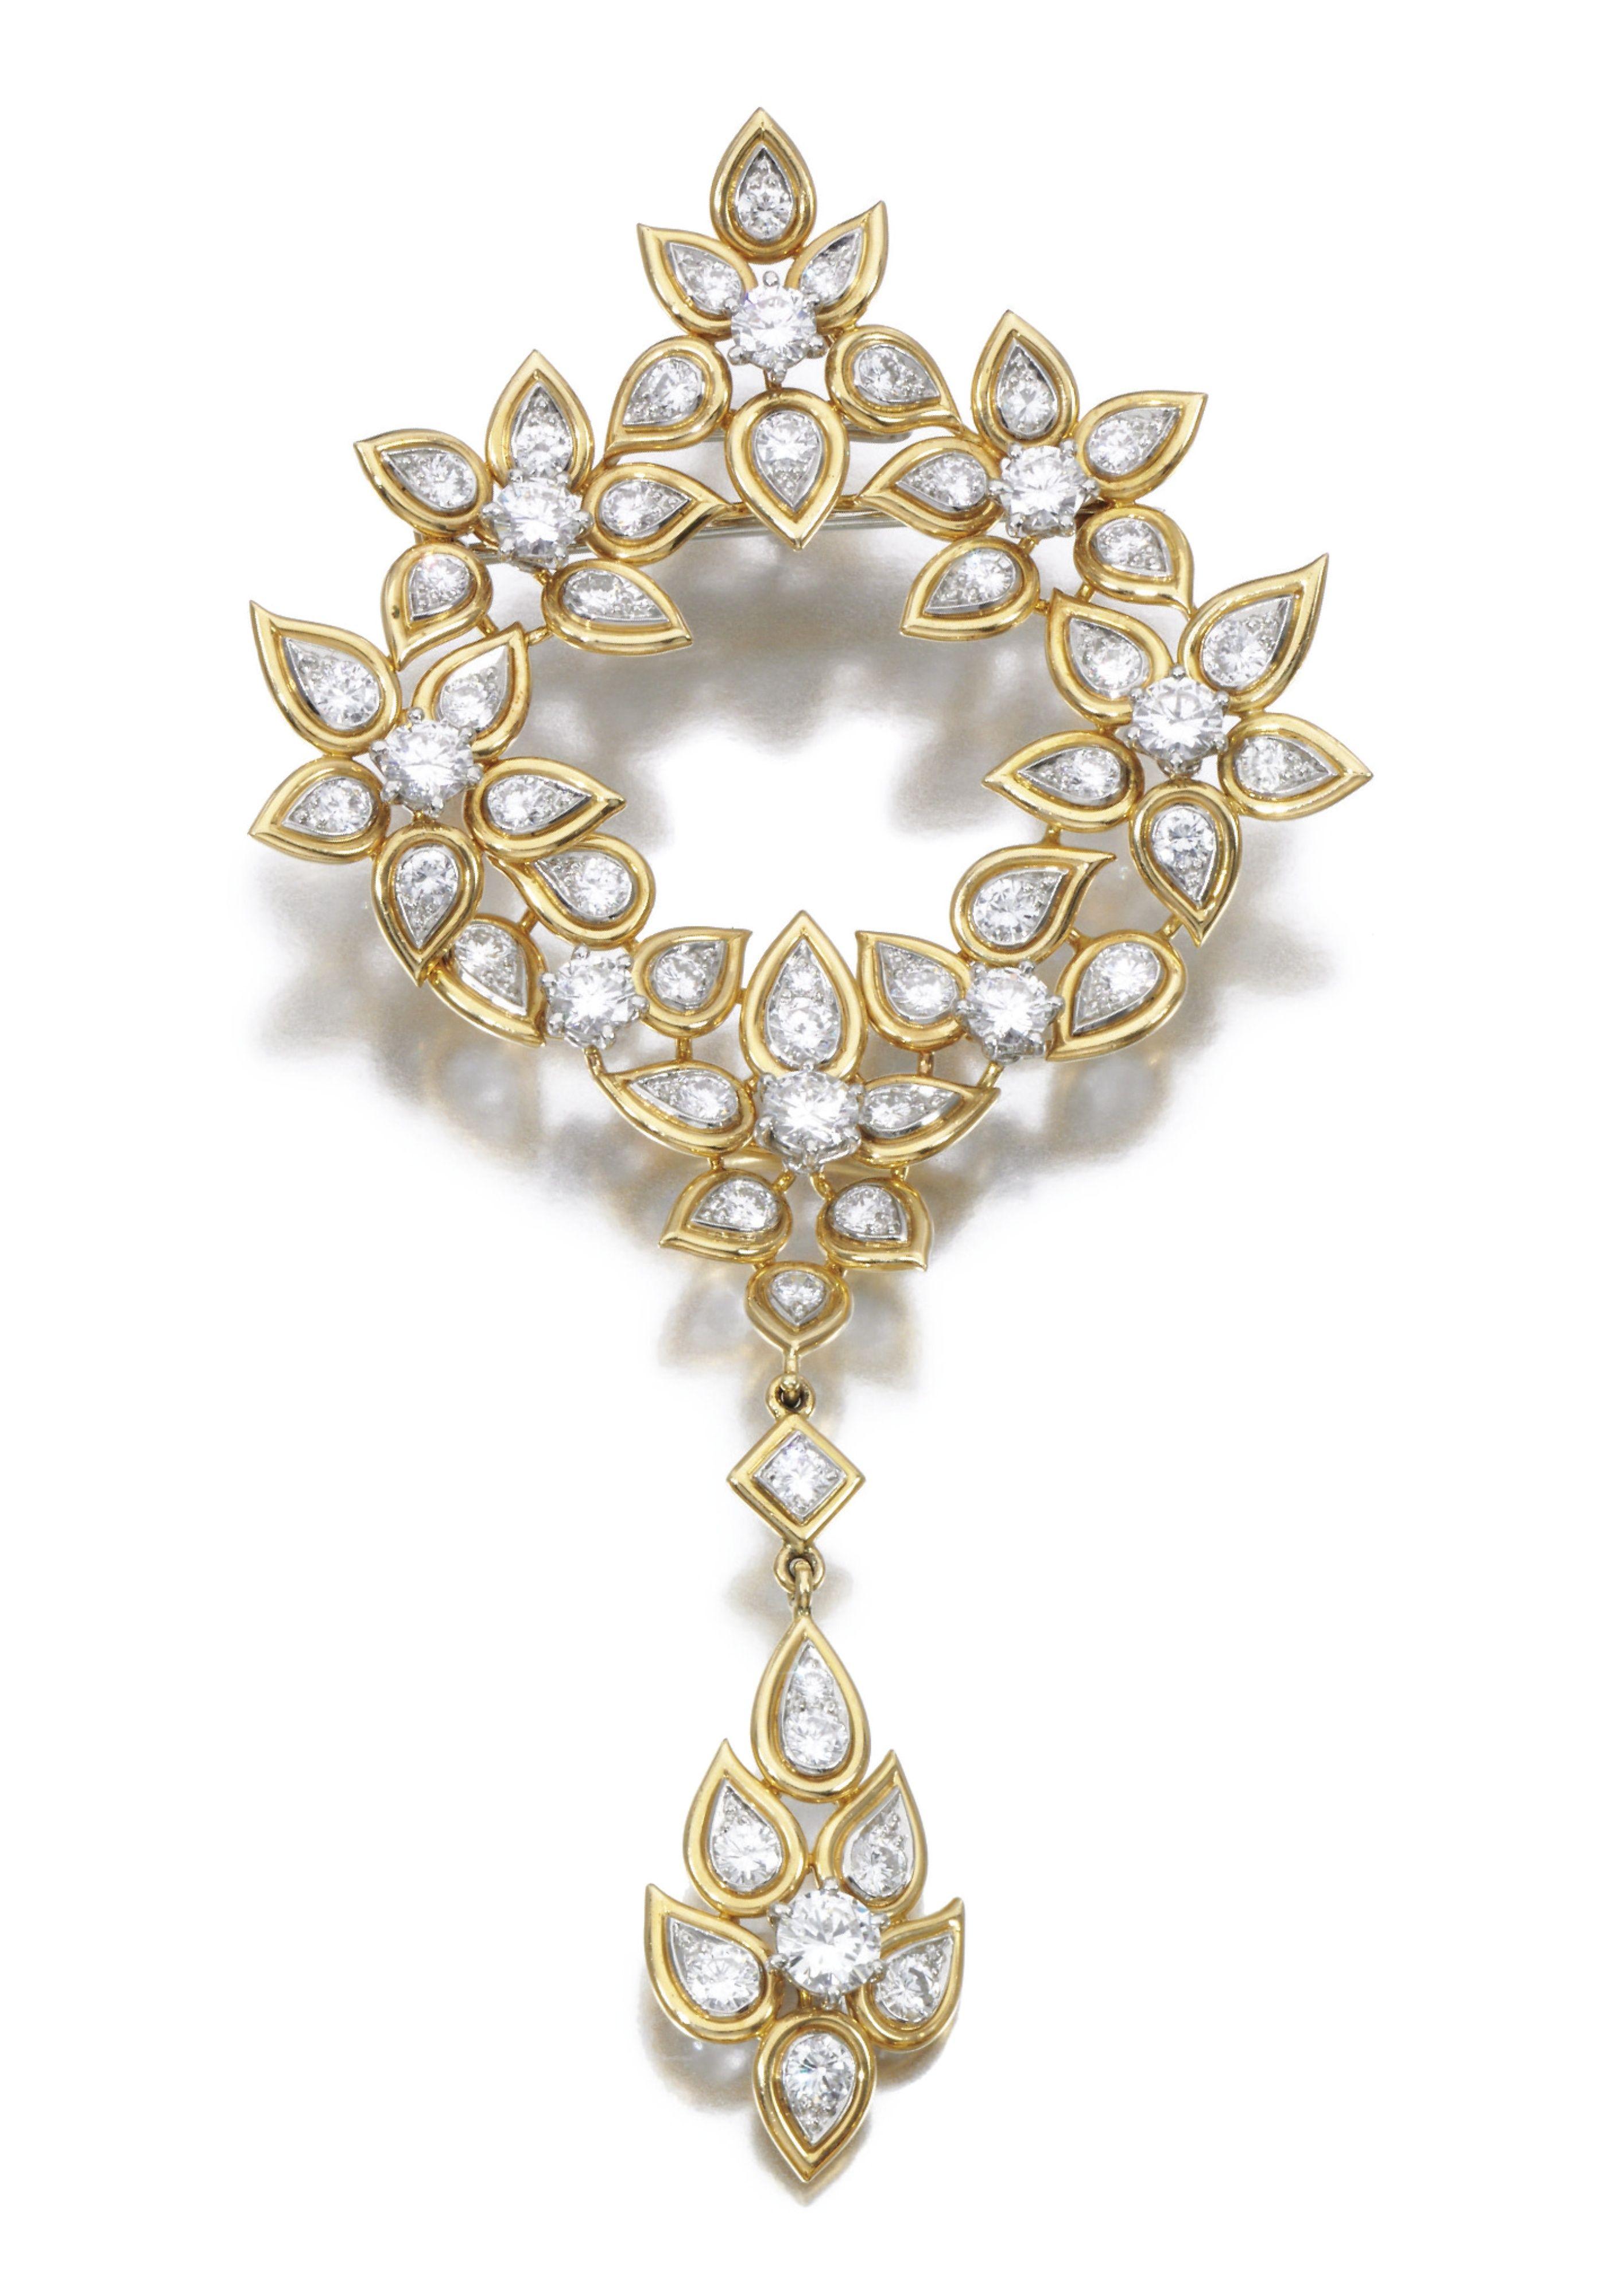 Diamond broochpendant cartier of foliate design set with